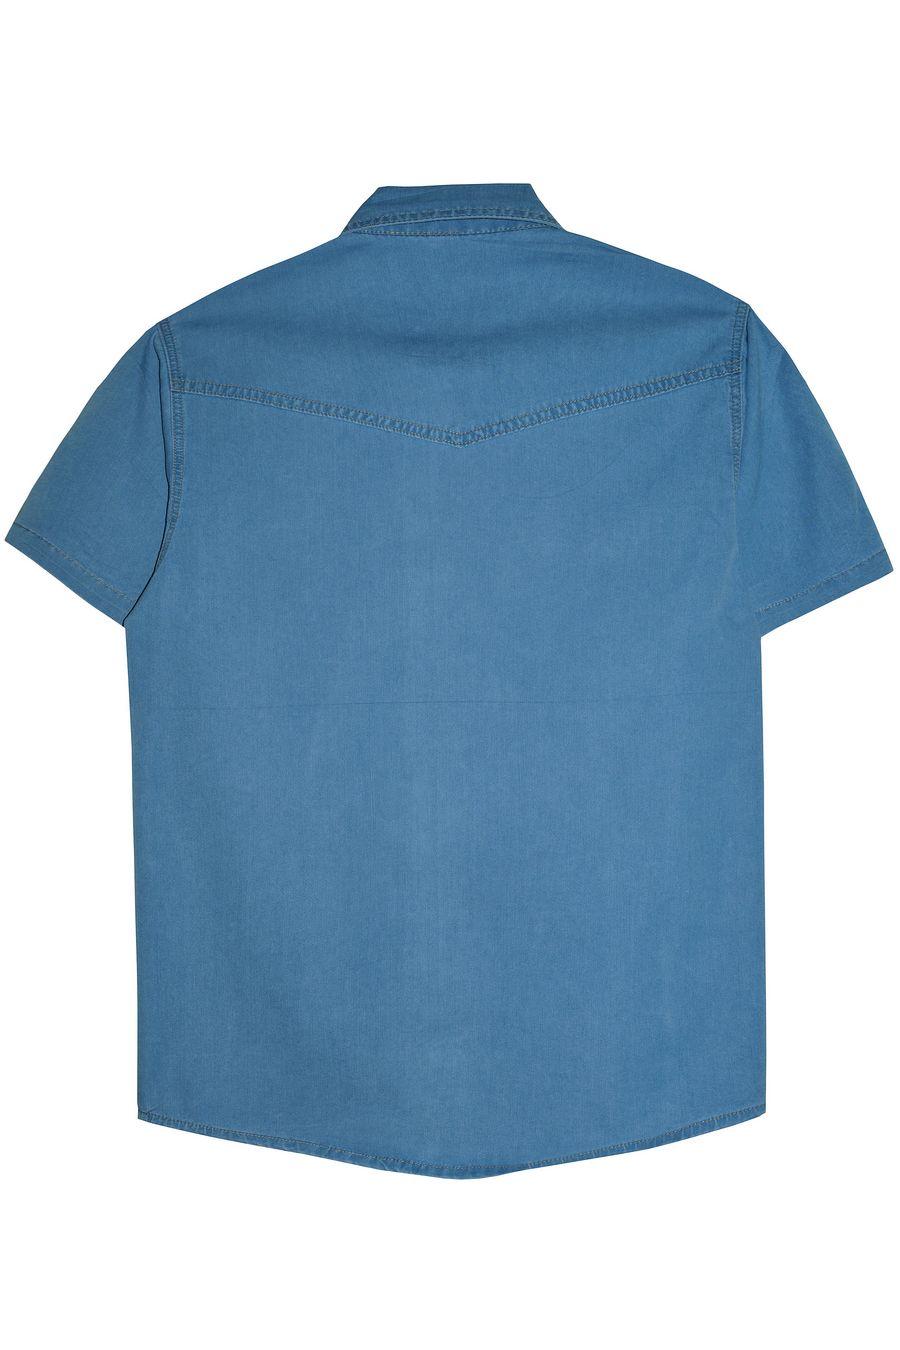 Рубашка мужская Vicucs 728E/CT-321-21 (S-2XL) - фото 2